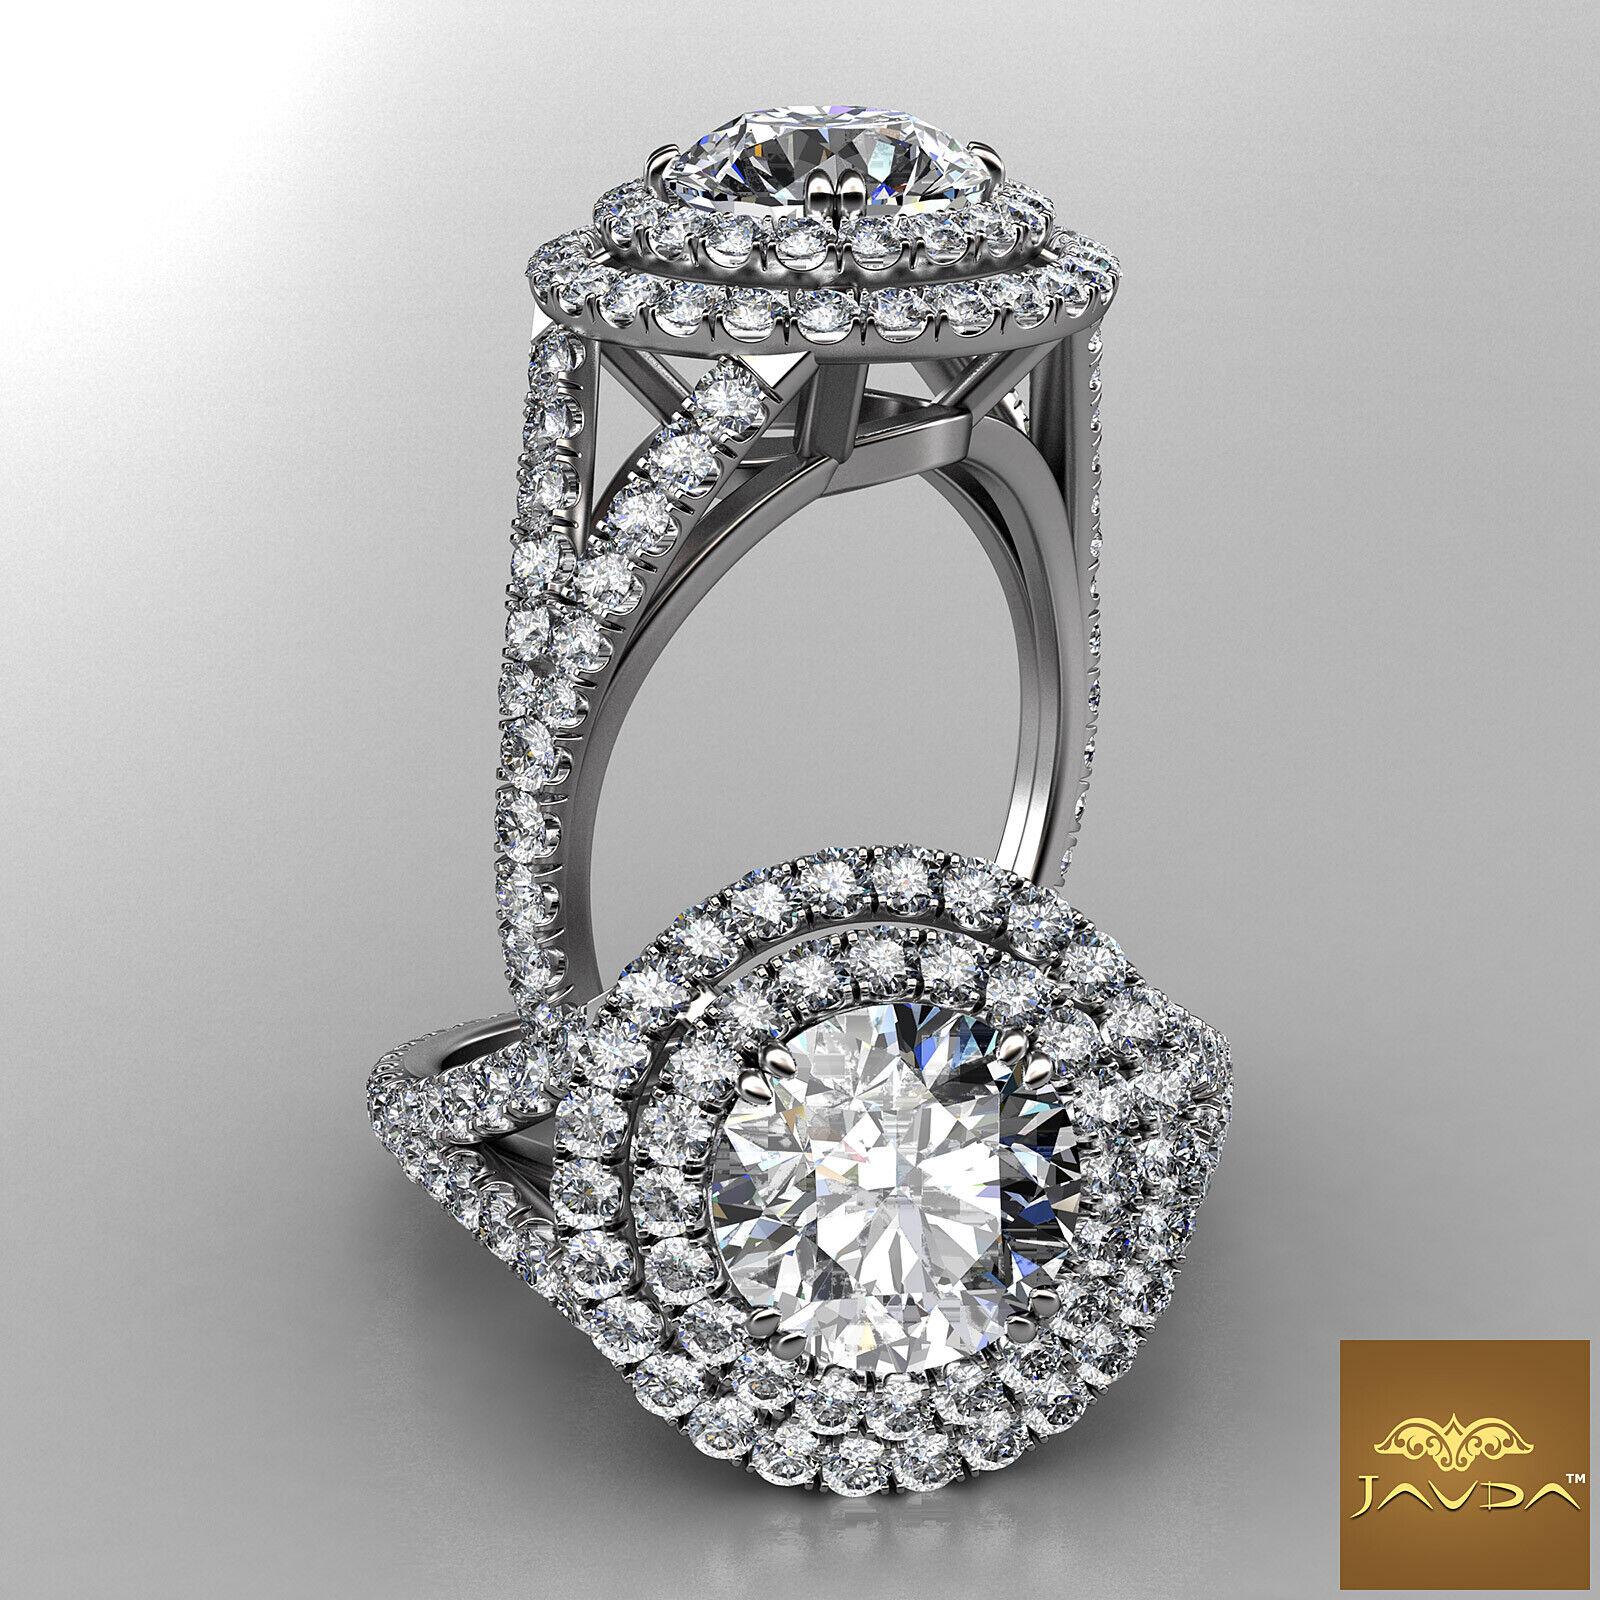 4.4ctw Double Halo Split Shank Round Diamond  Engagement Ring GIA I-SI1 w Gold